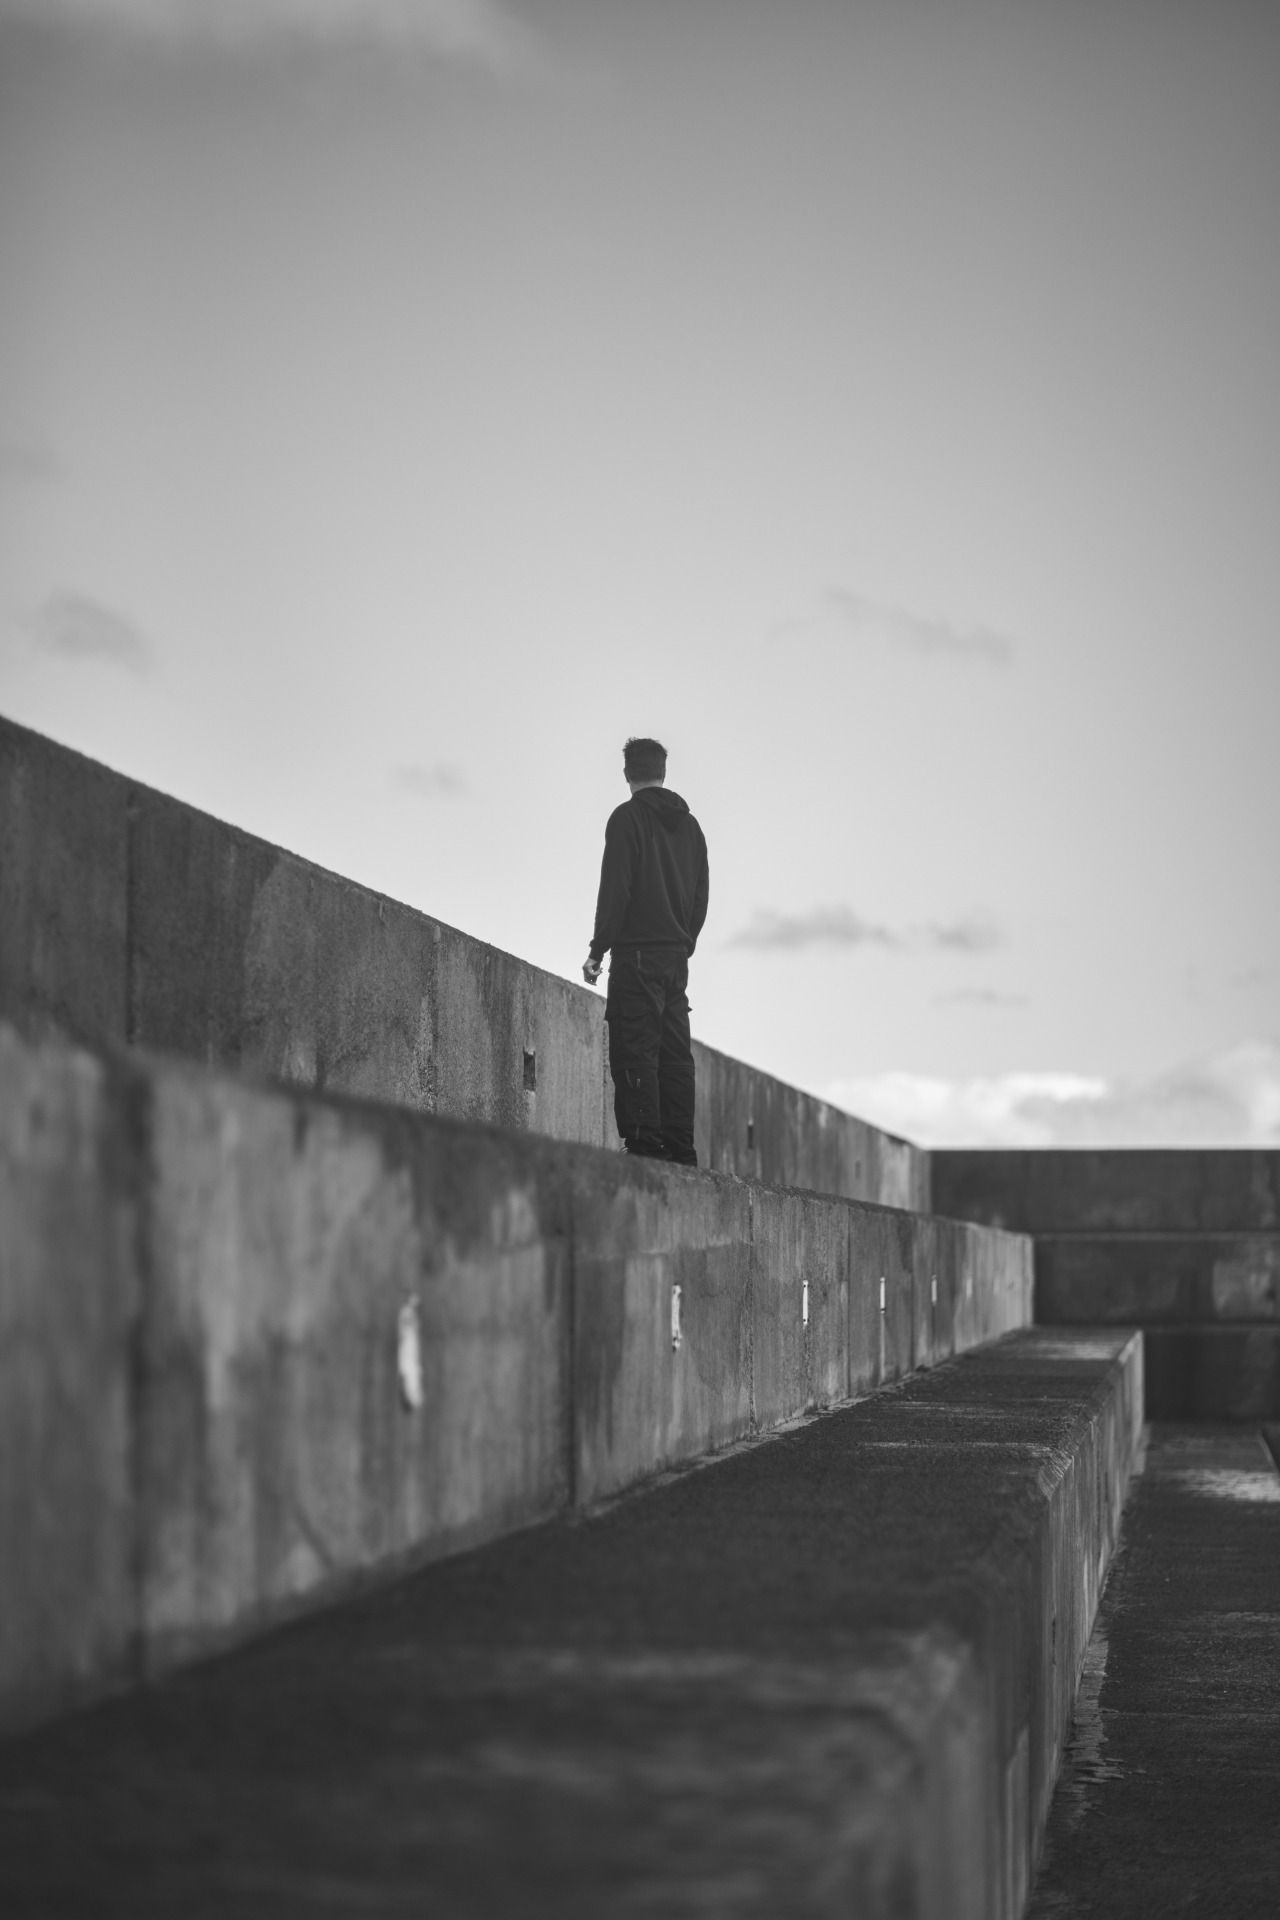 Steps - #blackandwhite #meolog #on #original #philosophical #Photographers #source #Tumblr